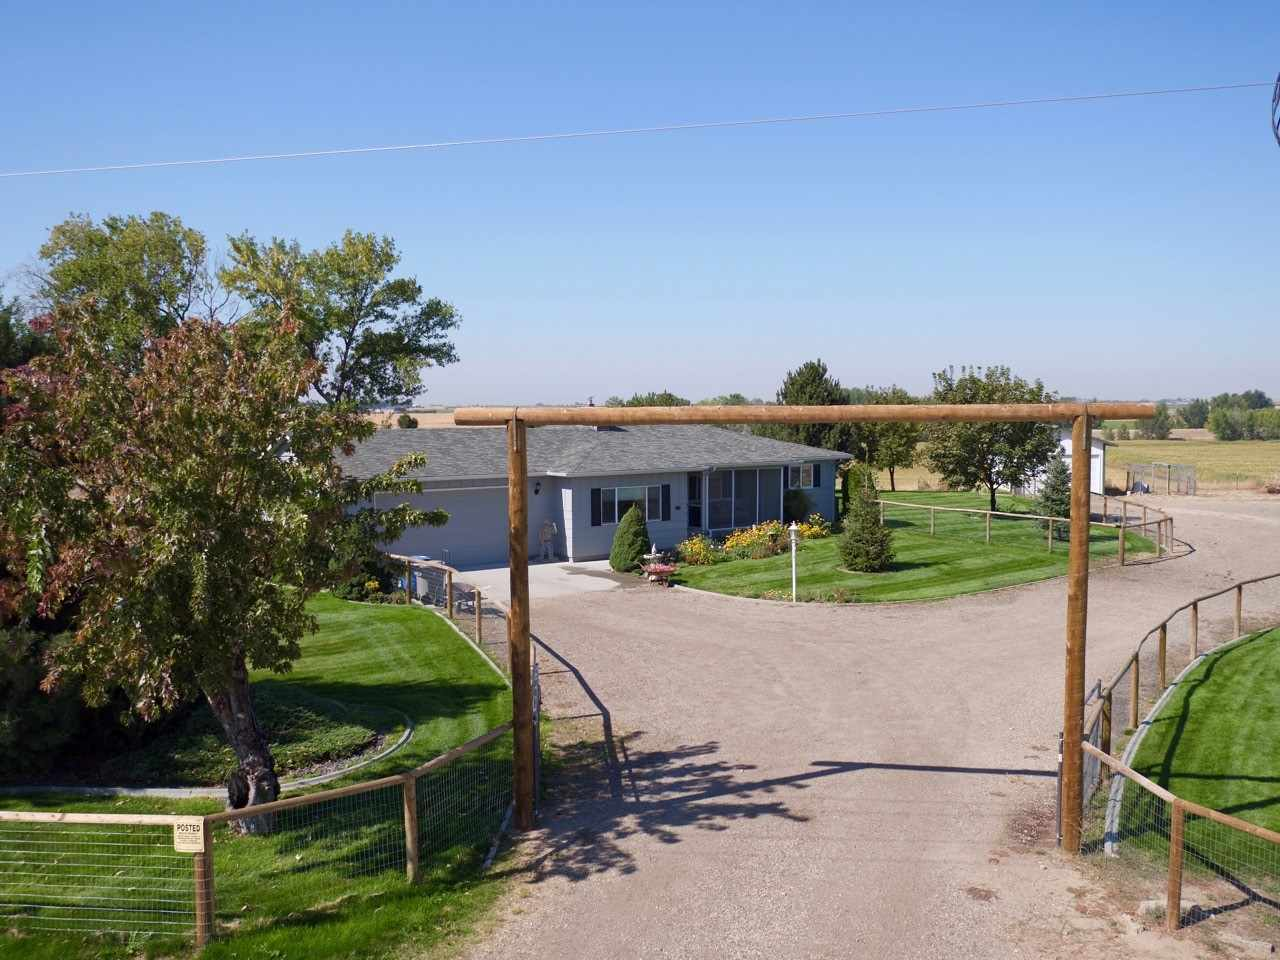 Villa per Vendita alle ore 26103 Harvey, Caldwell Caldwell, Idaho, 83607 Stati Uniti